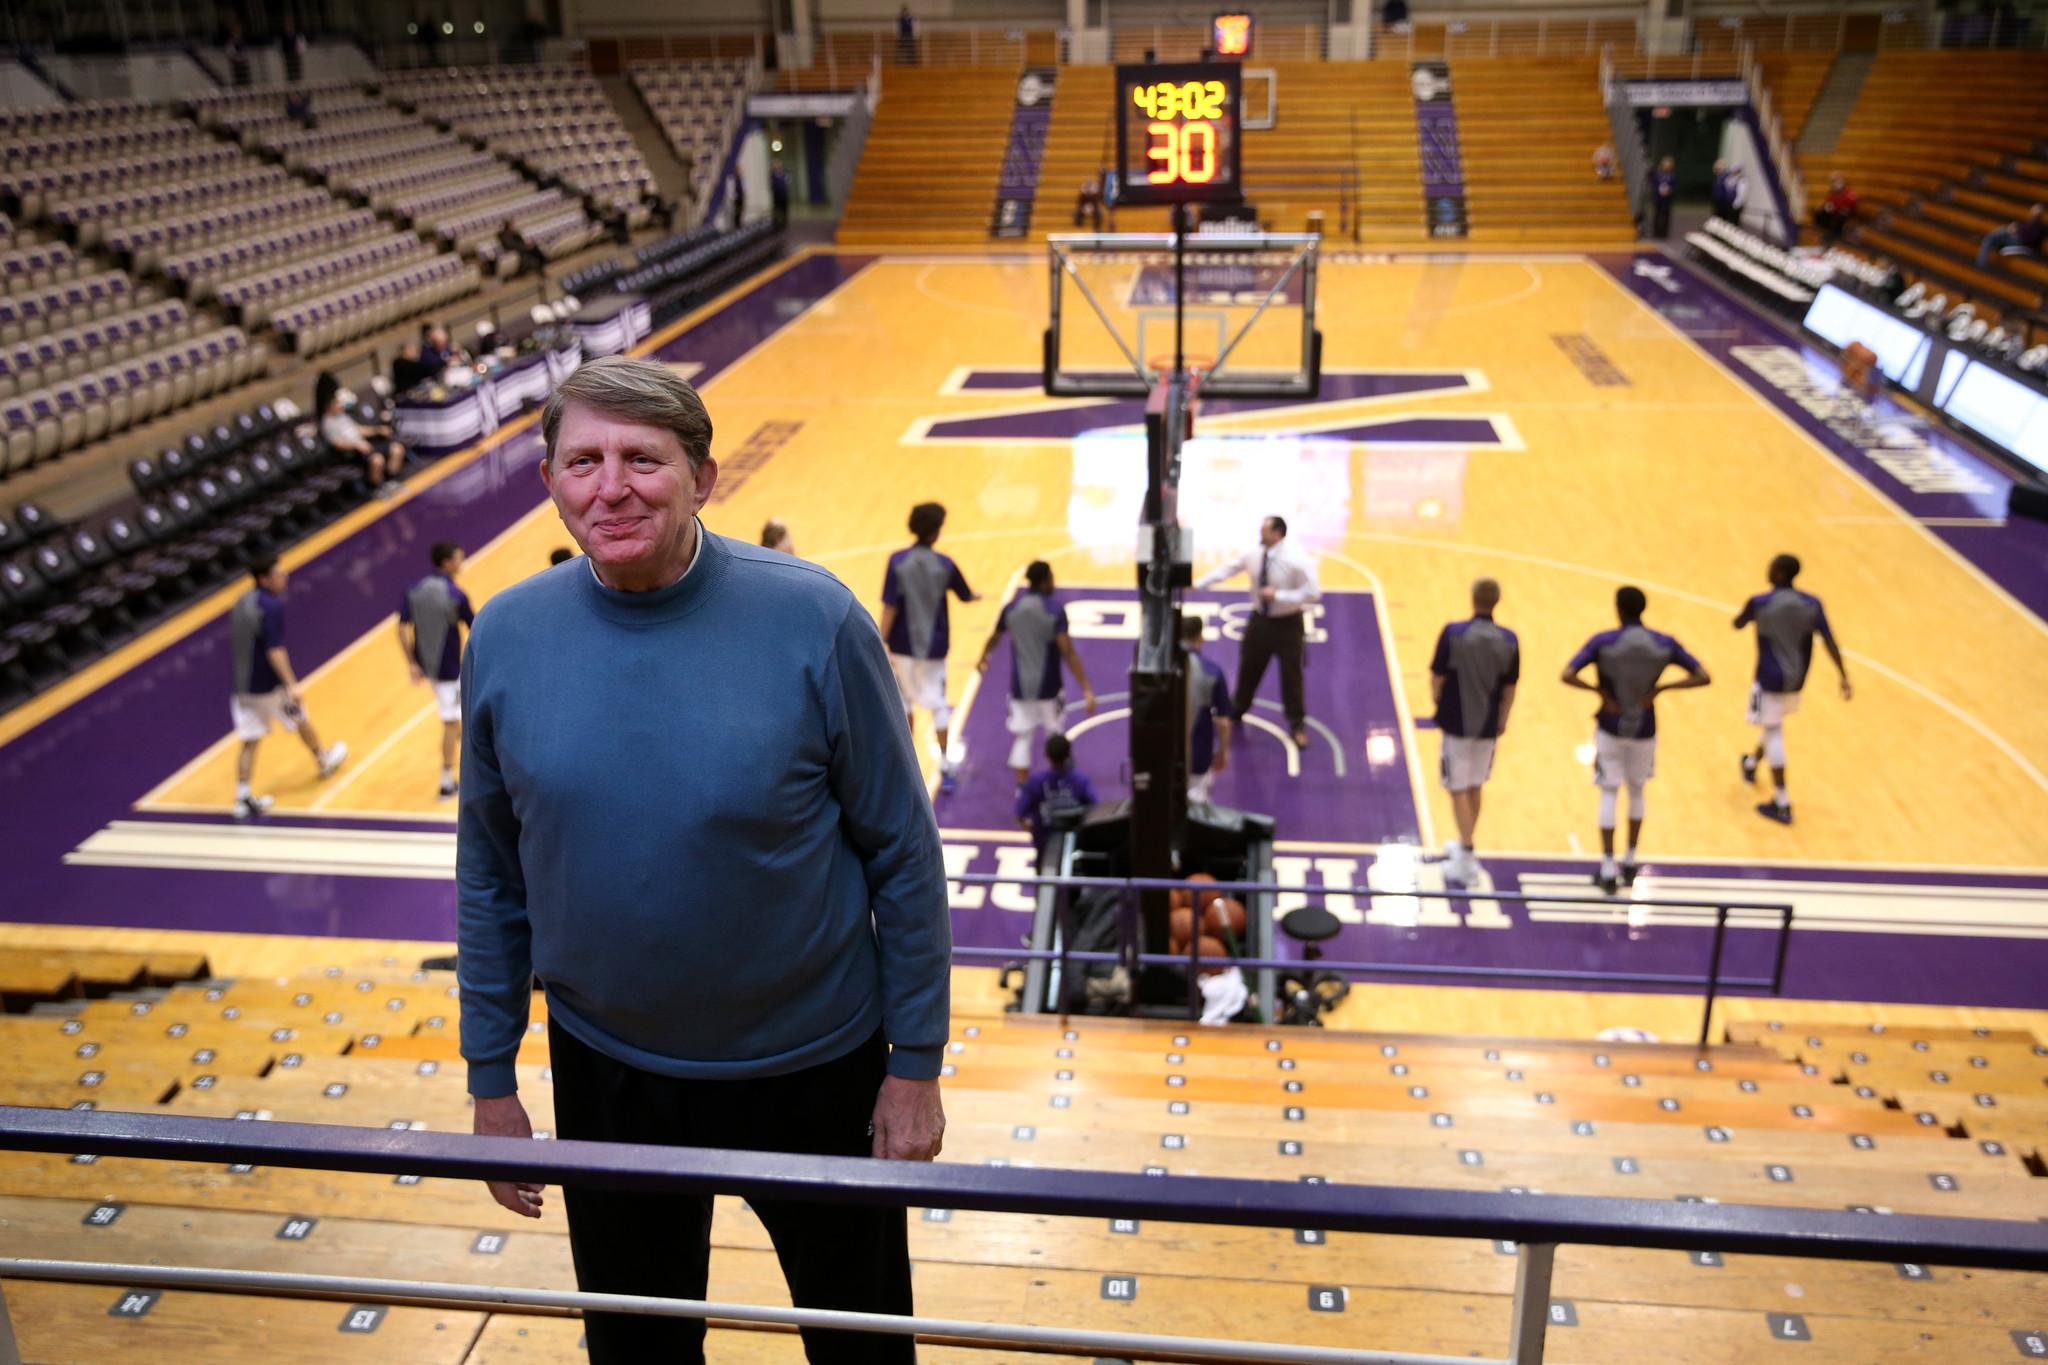 b05dc665074c Former Northwestern basketball great Joe Ruklick part of basketball history  - Chicago Tribune